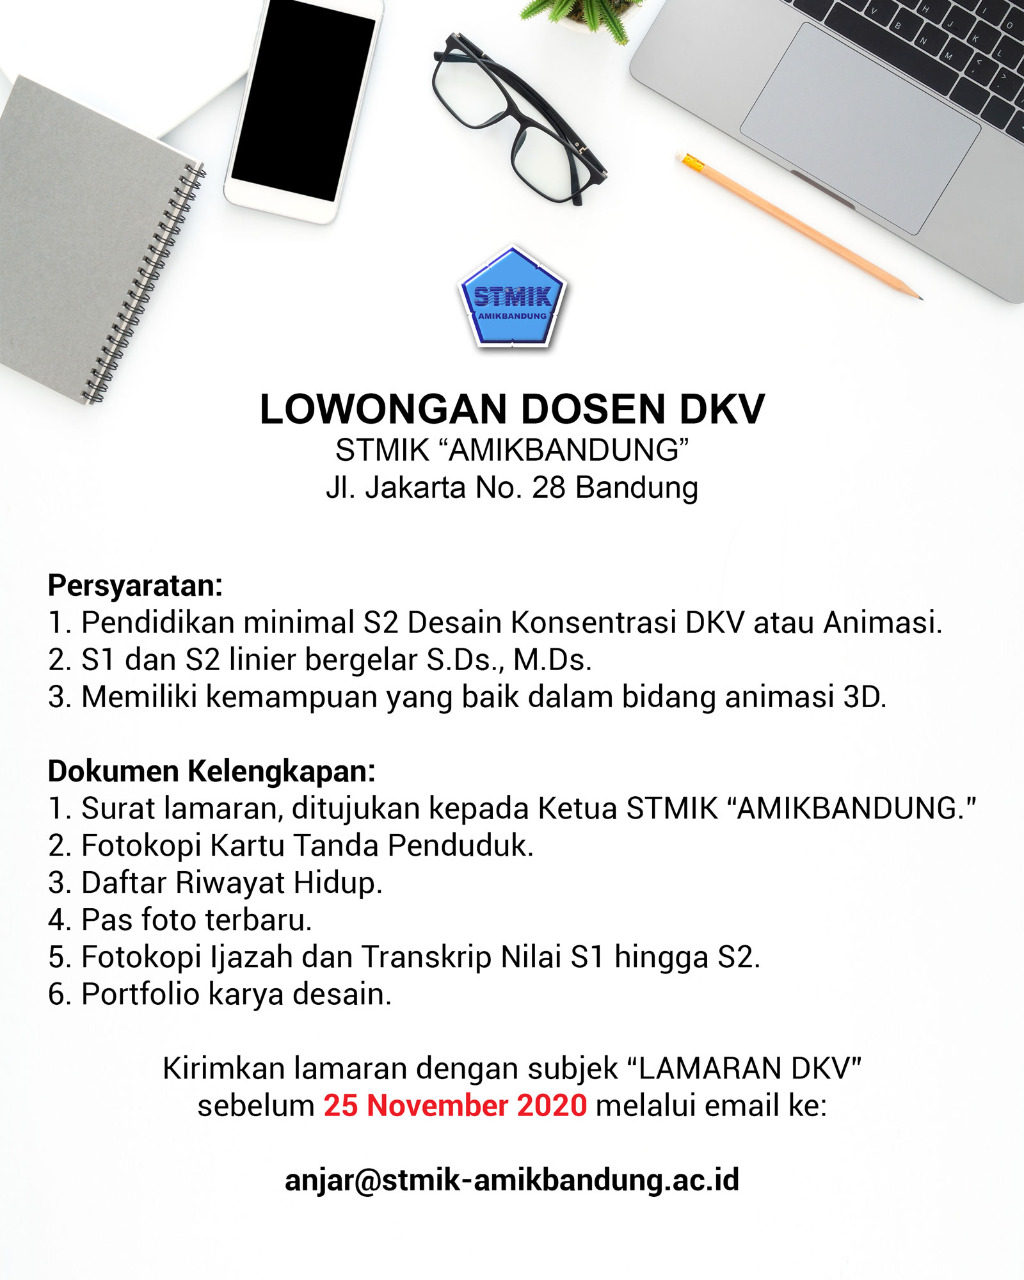 Lowongan Pekerjaan STMIK AMIK Bandung